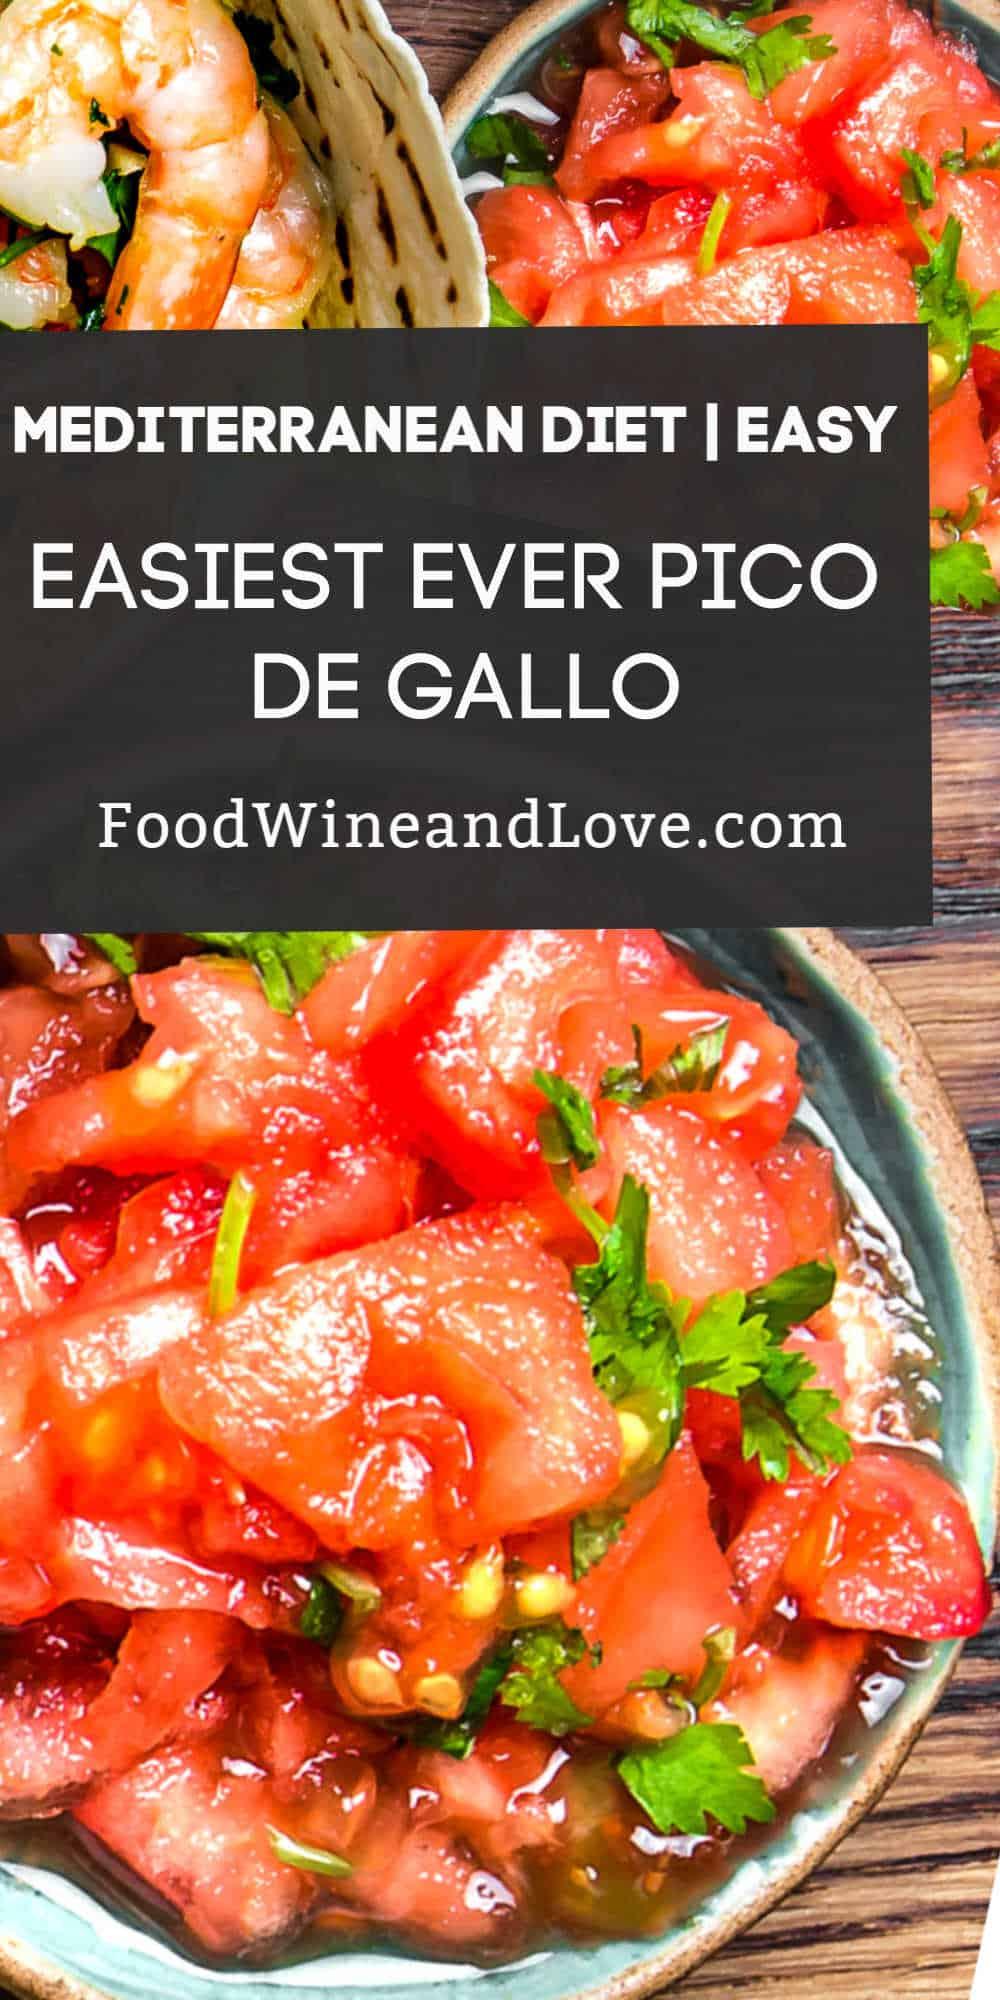 The Easiest Ever Pico De Gallo